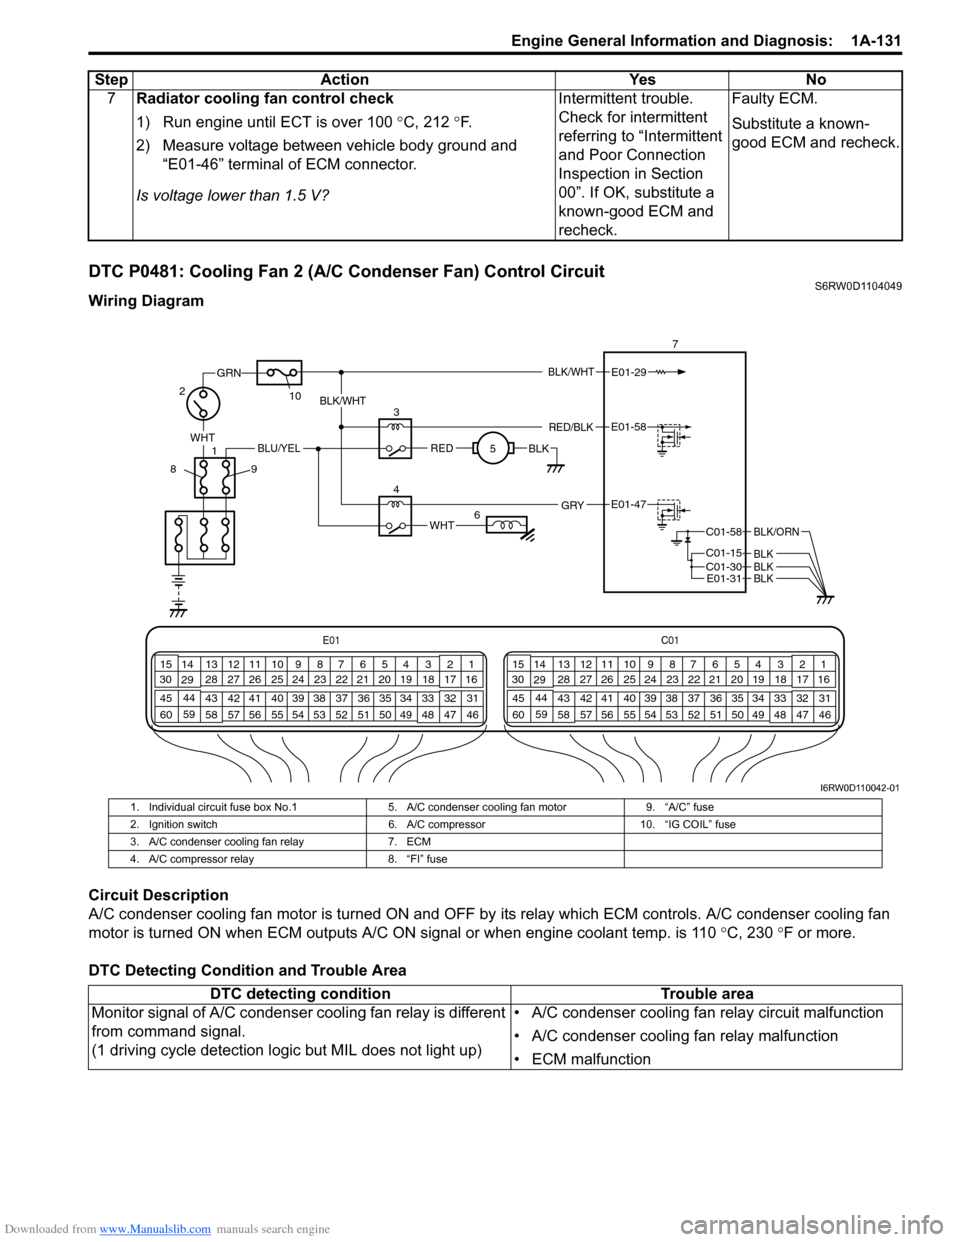 Suzuki Condenser Diagram Electrical Wiring Diagrams Ac Fuse Box On Sx4 Trusted Fuel Line